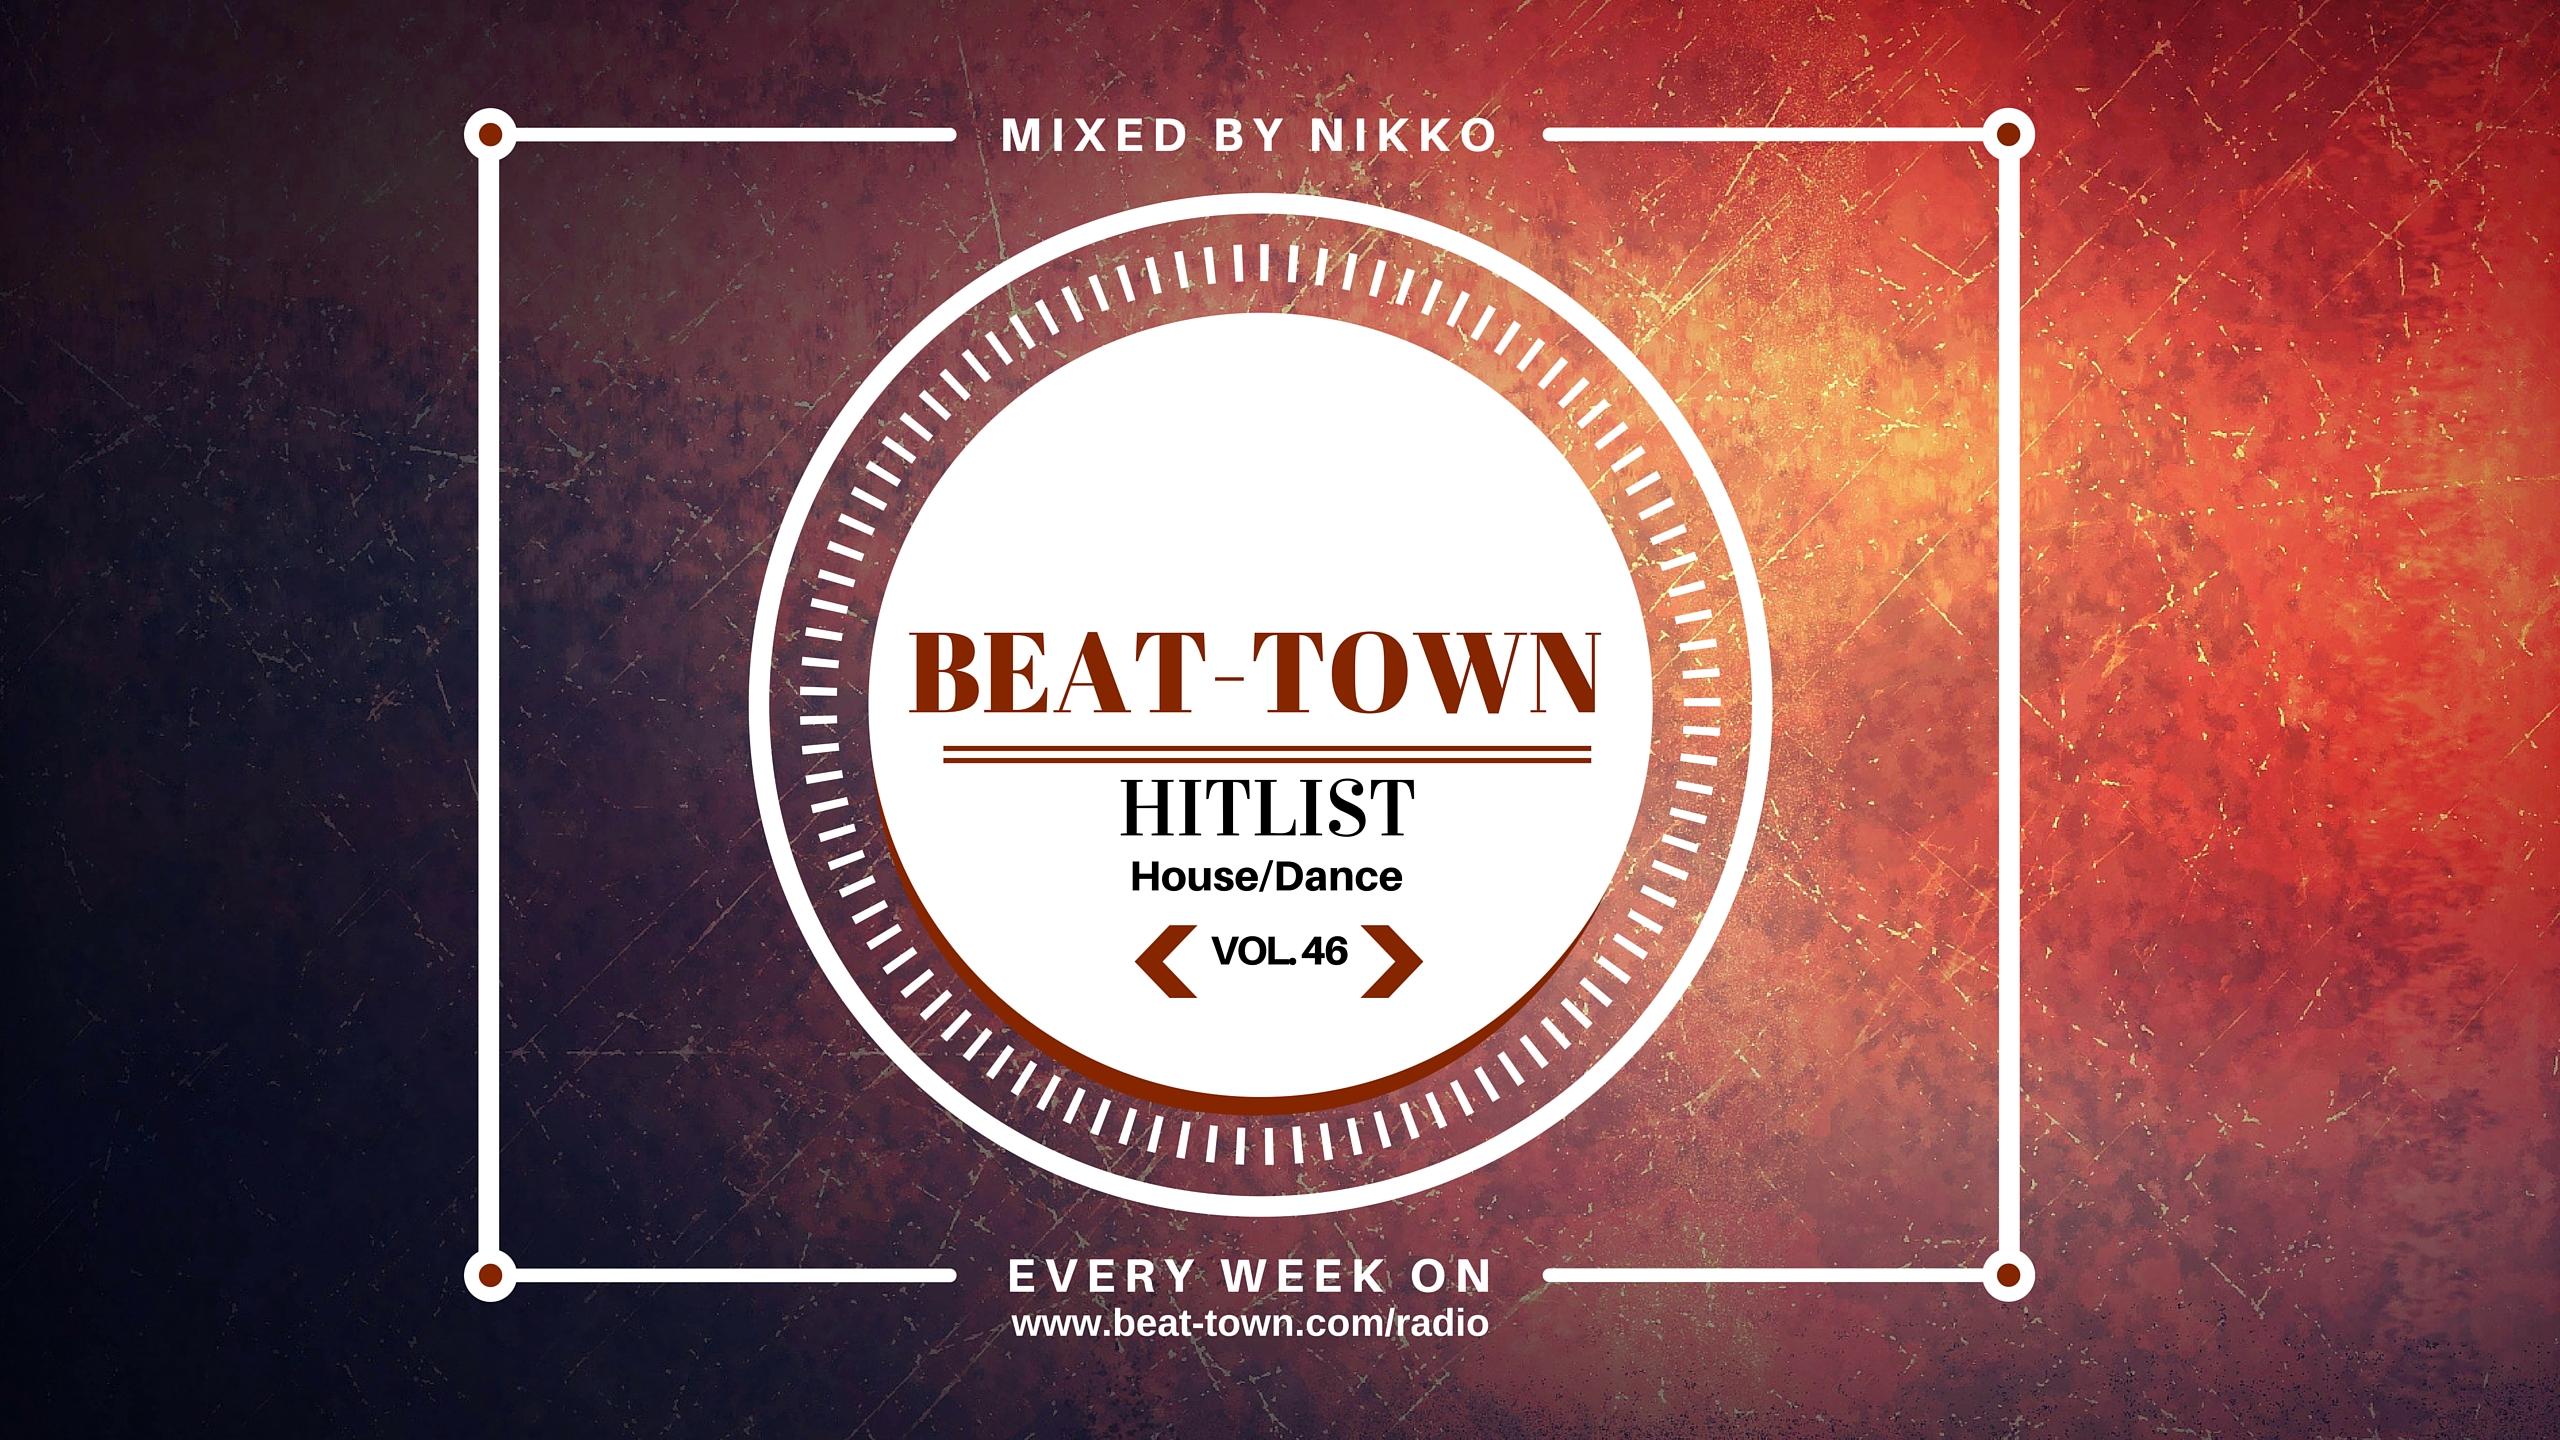 Beat-Town Radio: Hitlist Vol. 46 (House/Dance)